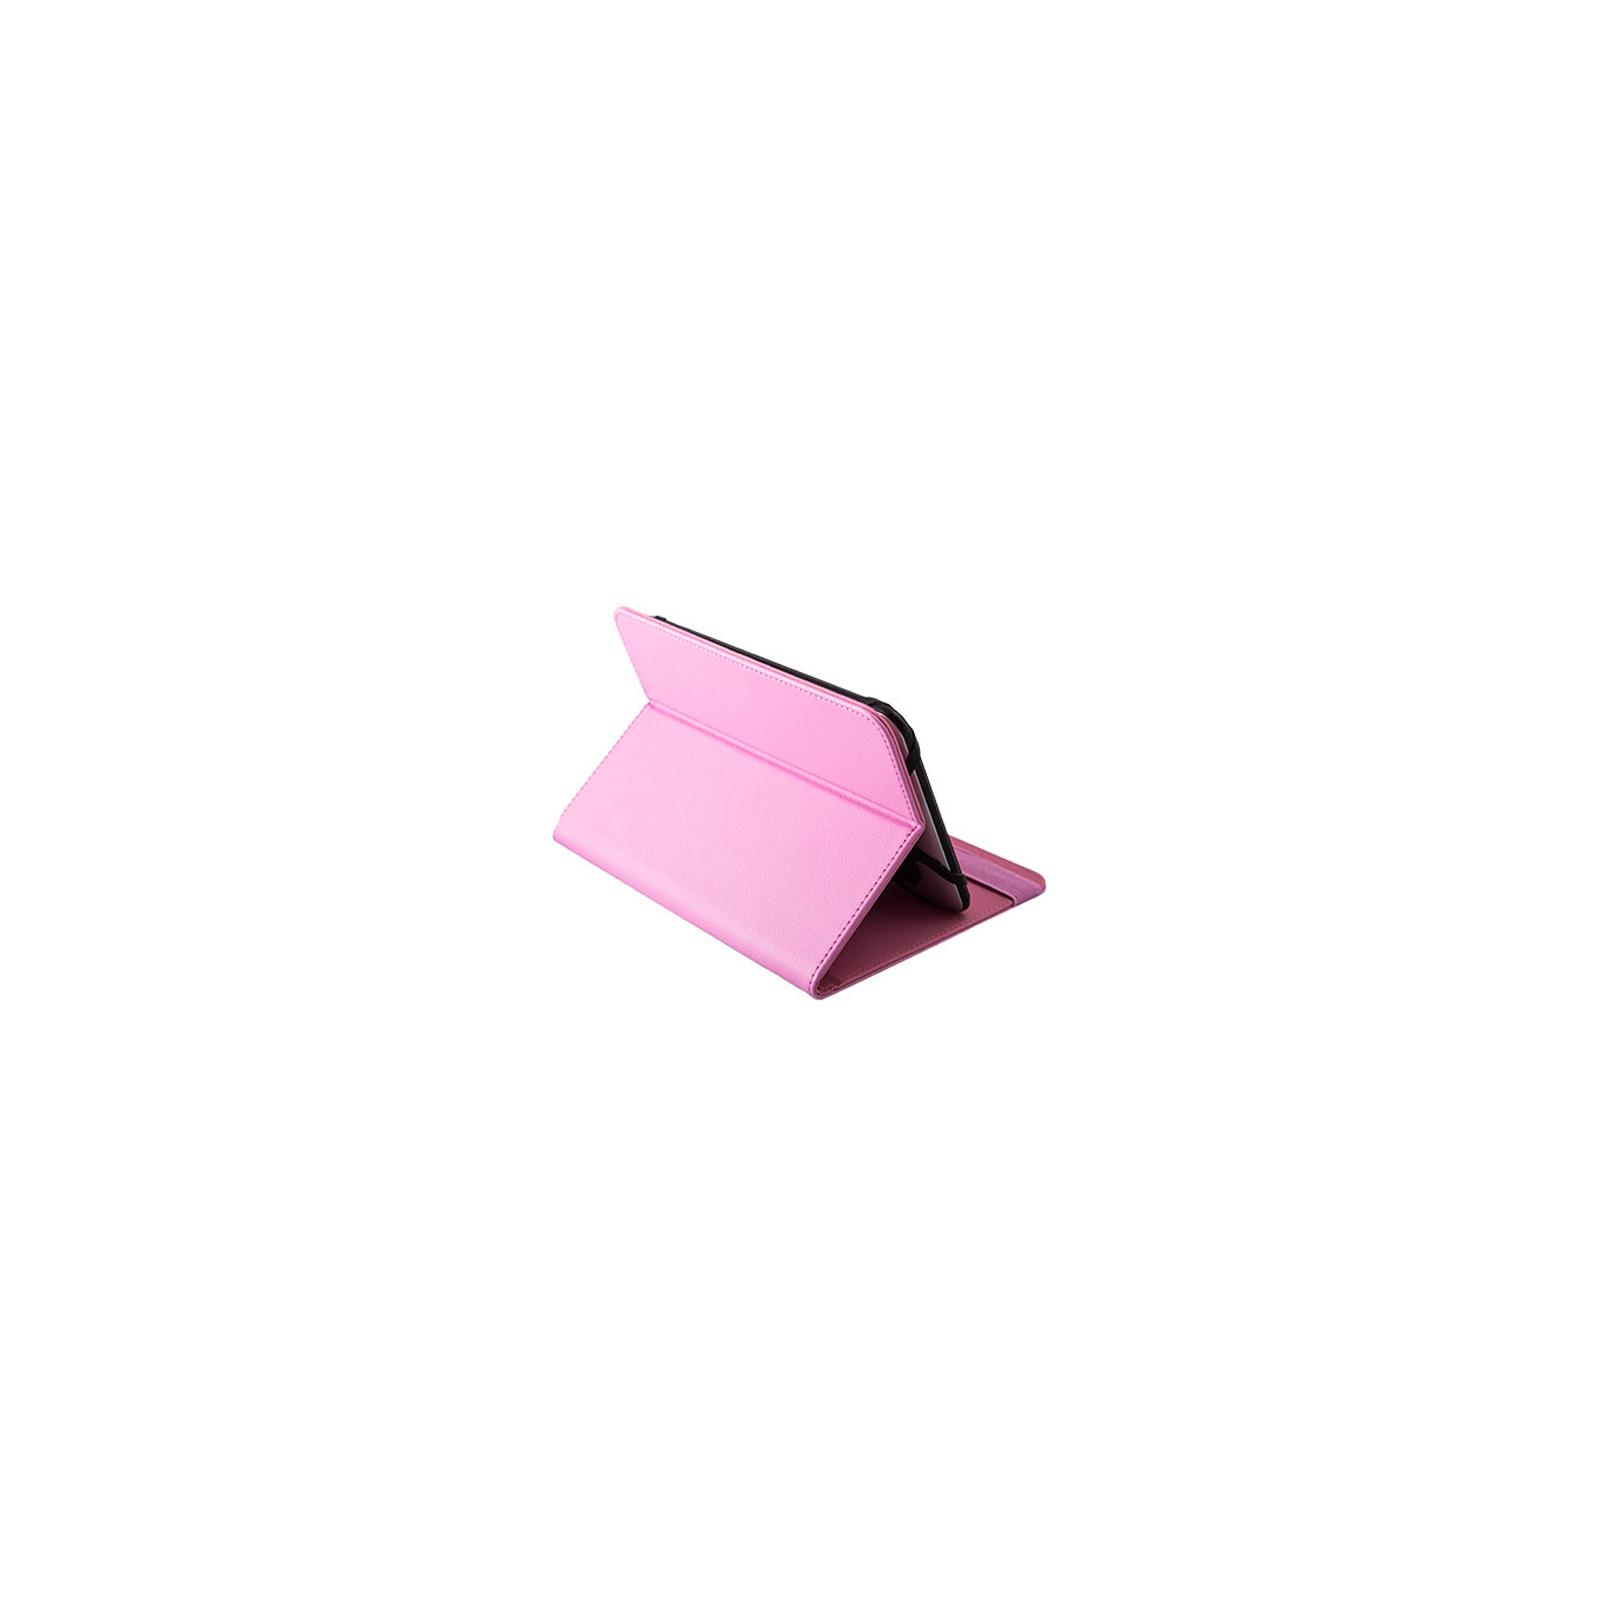 "Чехол для планшета Vellini 7"" Universal stand Pink (216876) изображение 4"